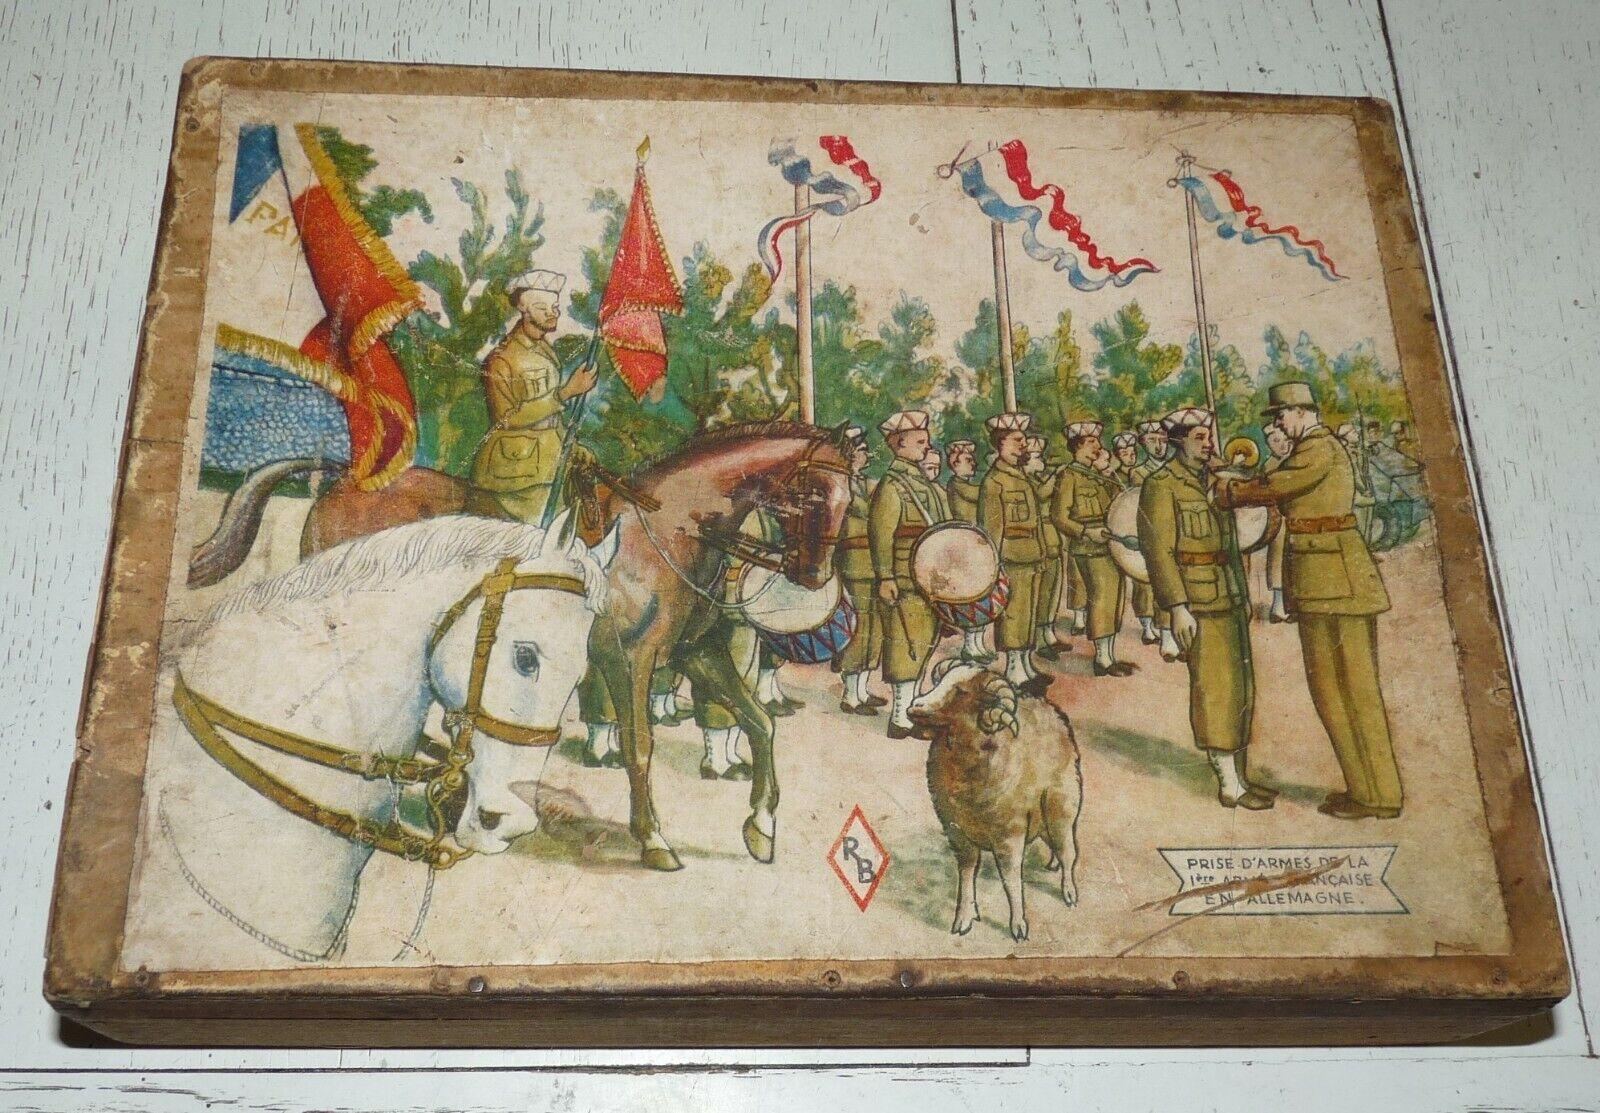 RARE VINTAGE 1945-48 BOITE CUBES PUZZLE 1ere ARMEE FRANCE DE LATTRE RHIN DANUBE